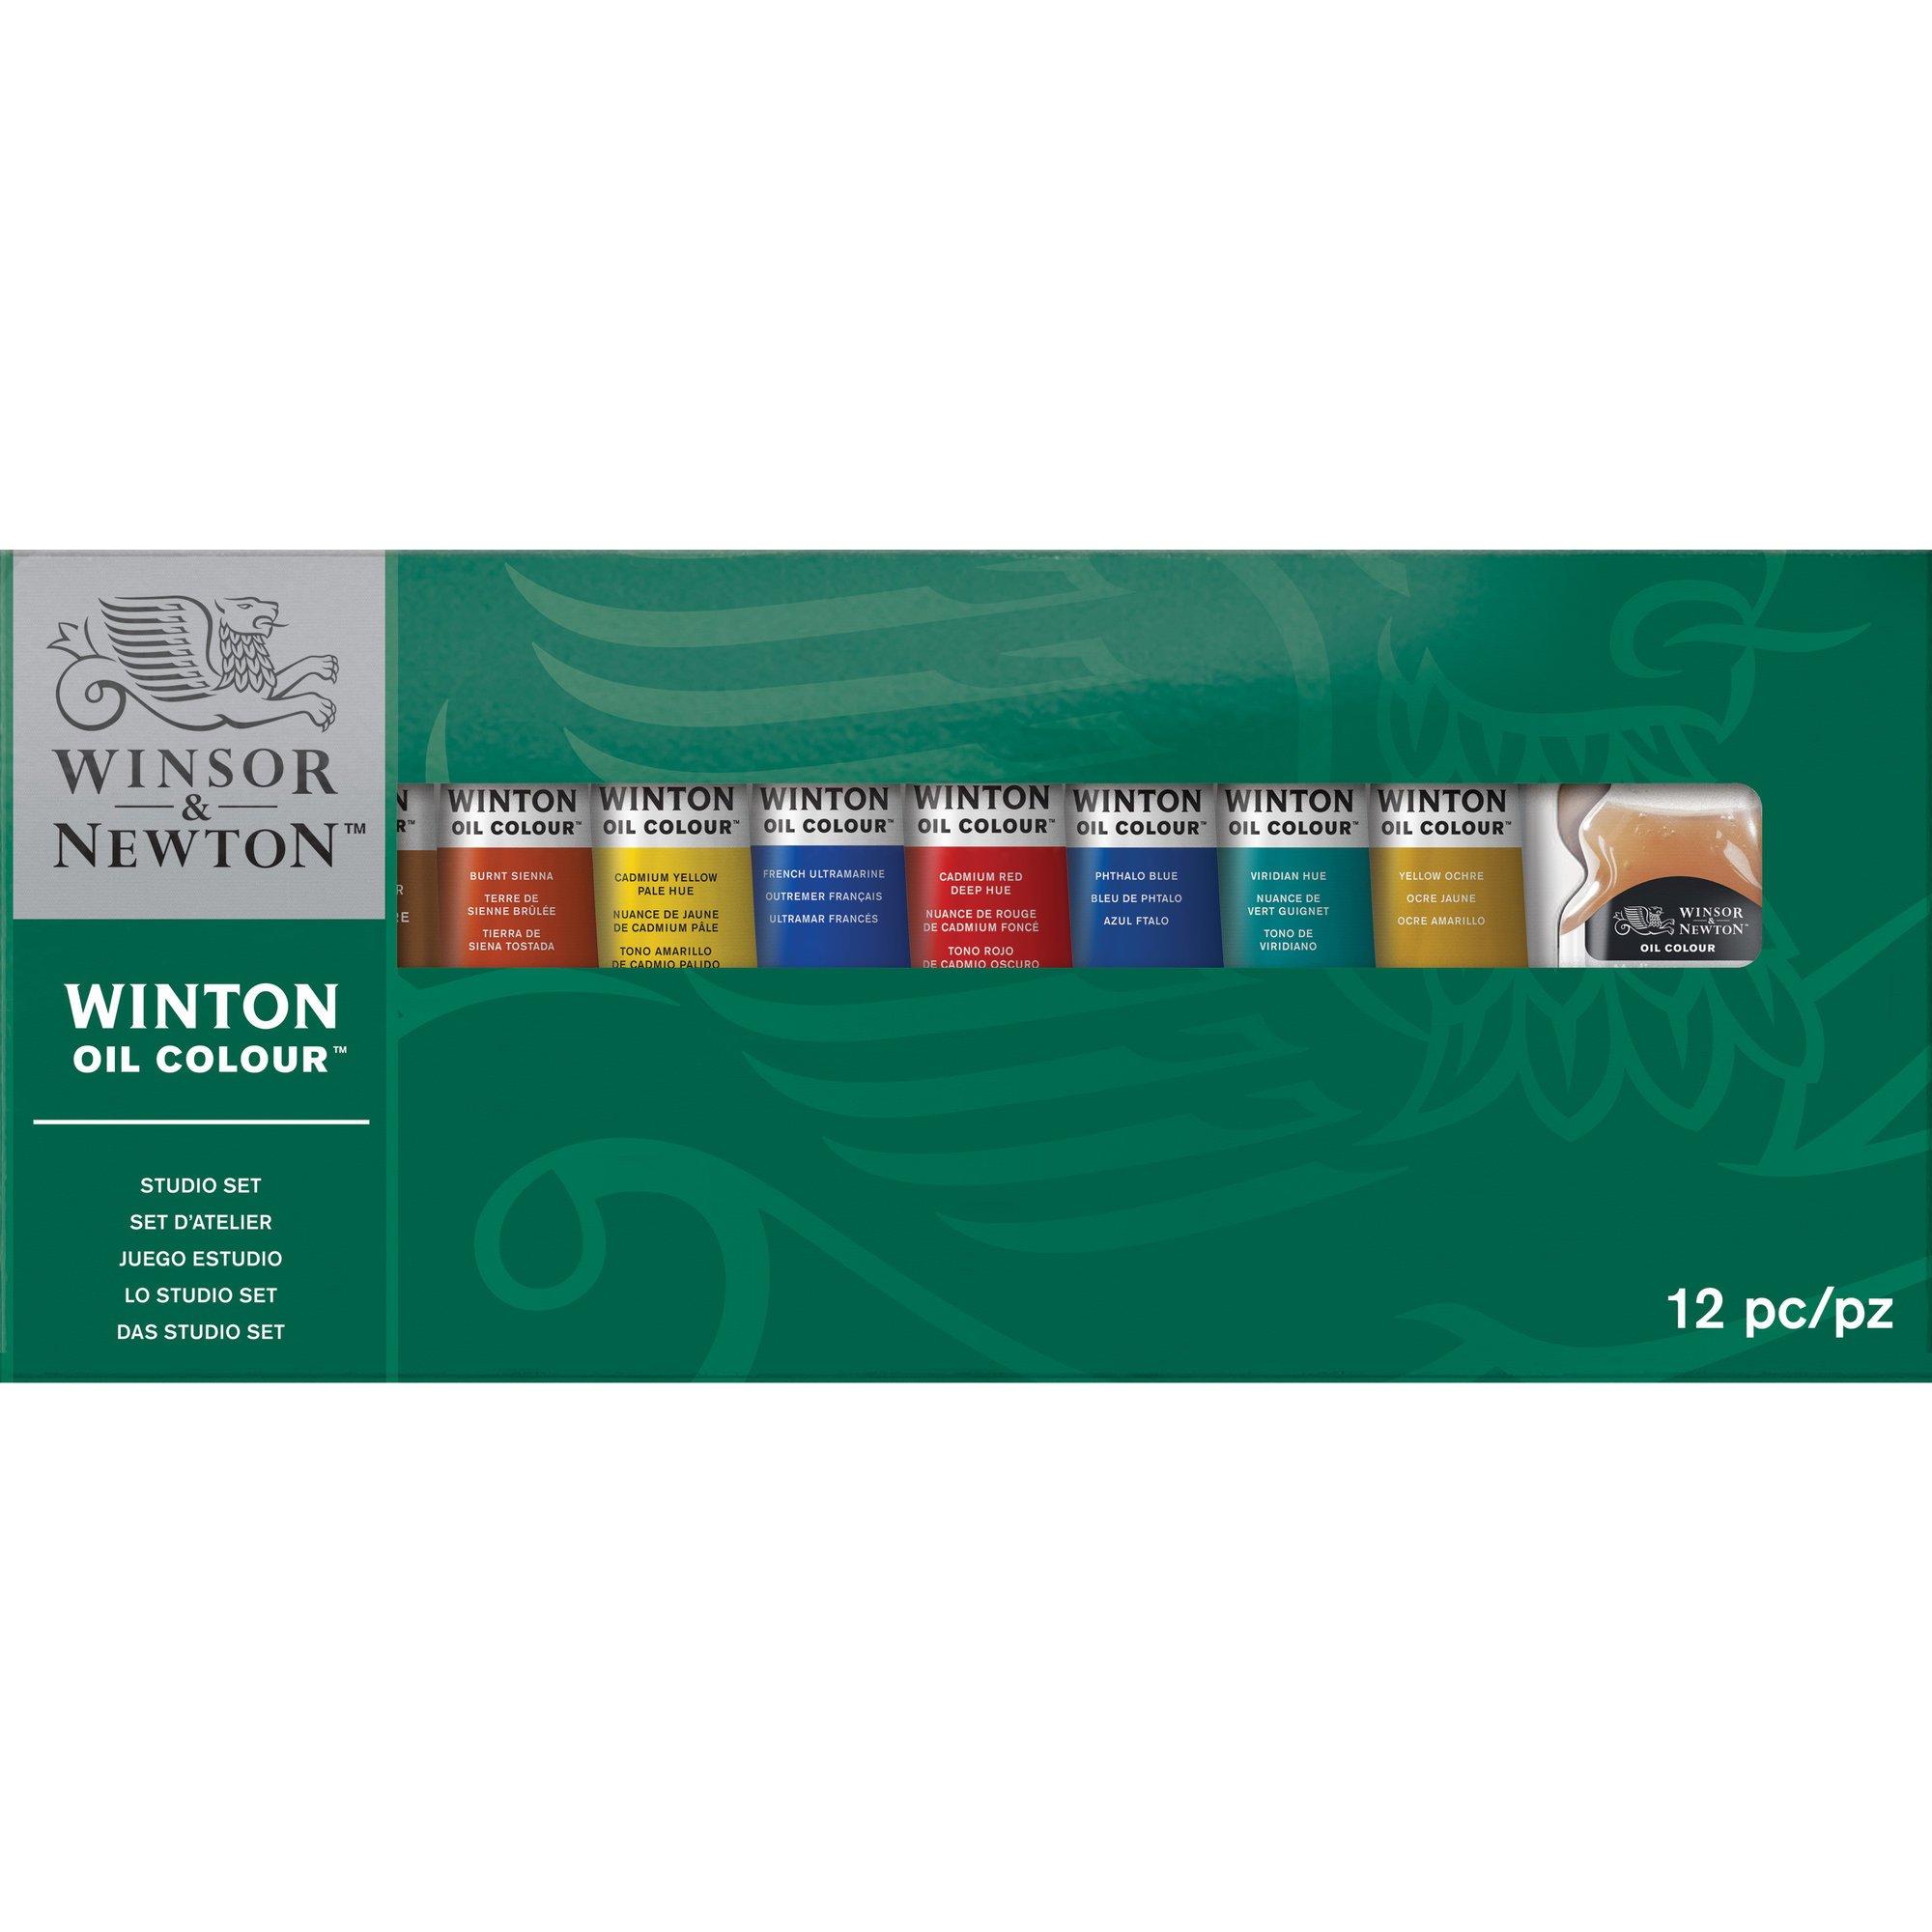 Winsor & Newton 1490620 Winton Oil Colour Studio Set by Winsor & Newton